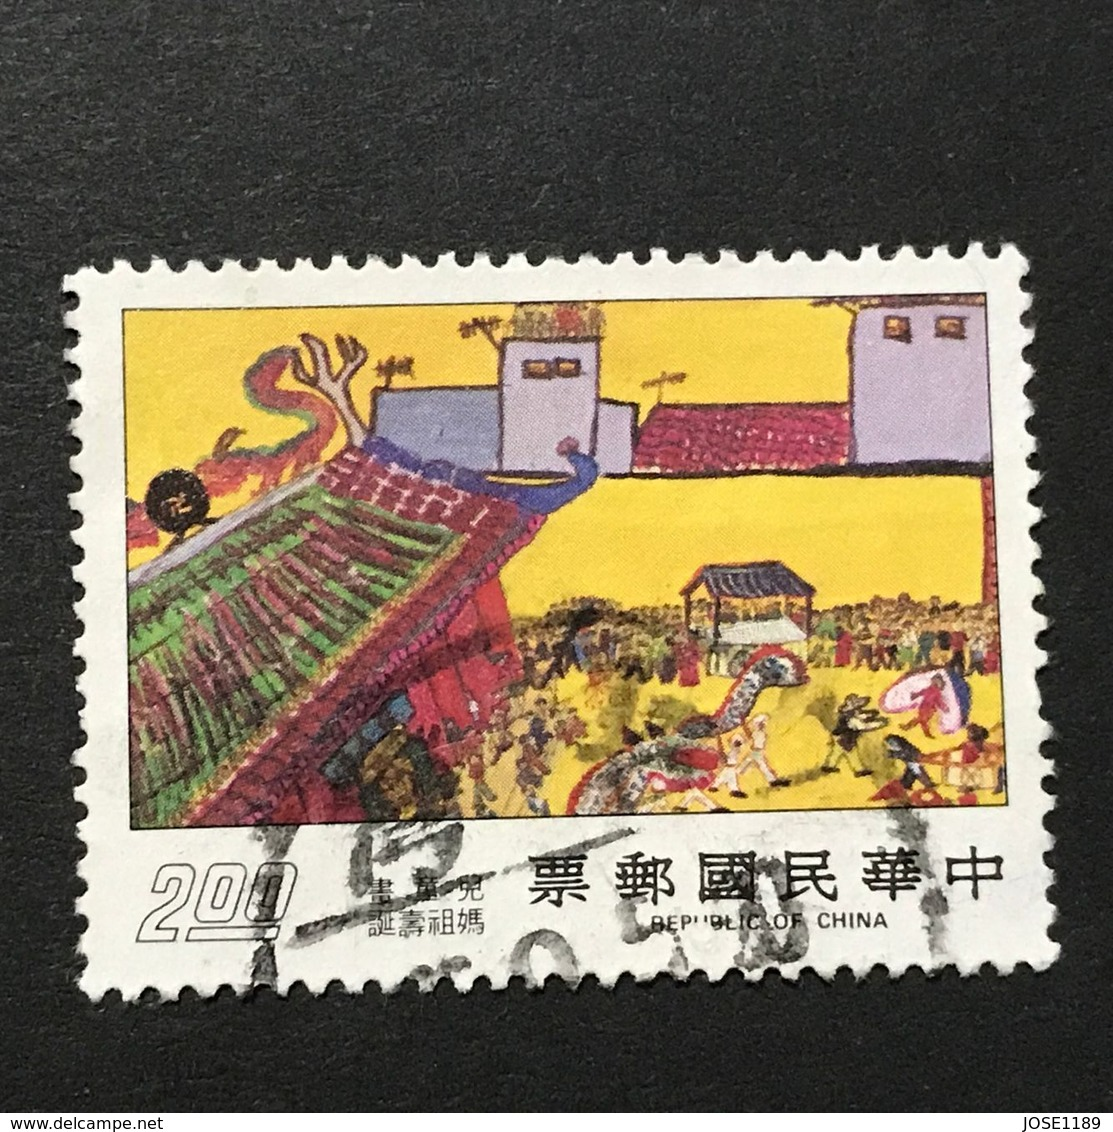 ◆◆◆Taiwán (Formosa)  1977  8th Exhib. Of World School Children's Art.     $2   USED   AA2335 - Gebraucht